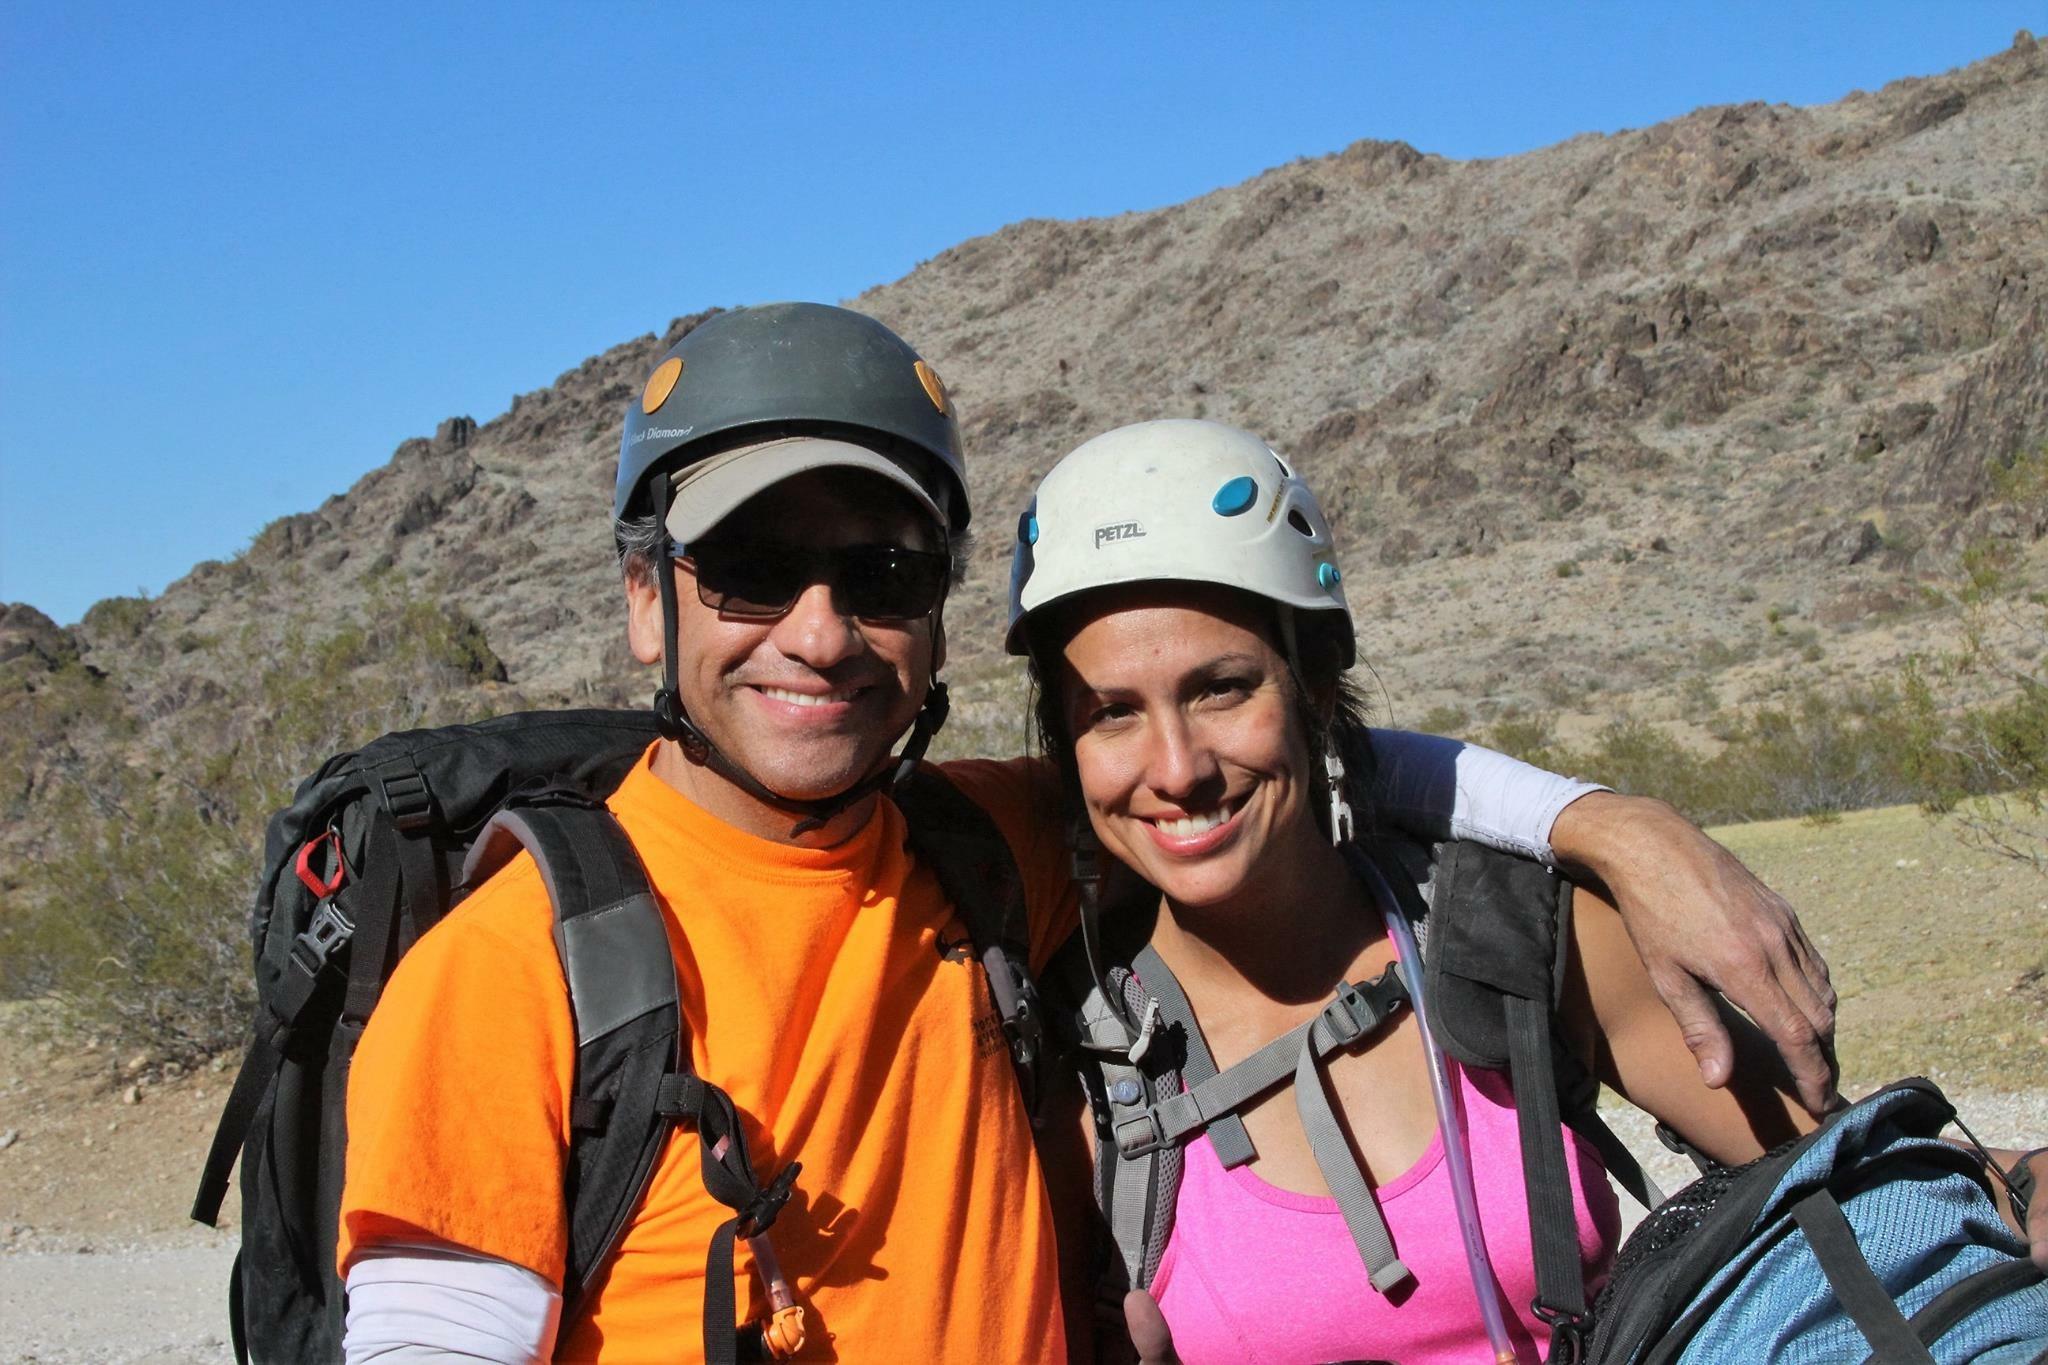 climbing, new jack city, california, outdoor, rock climbing, sport climbing